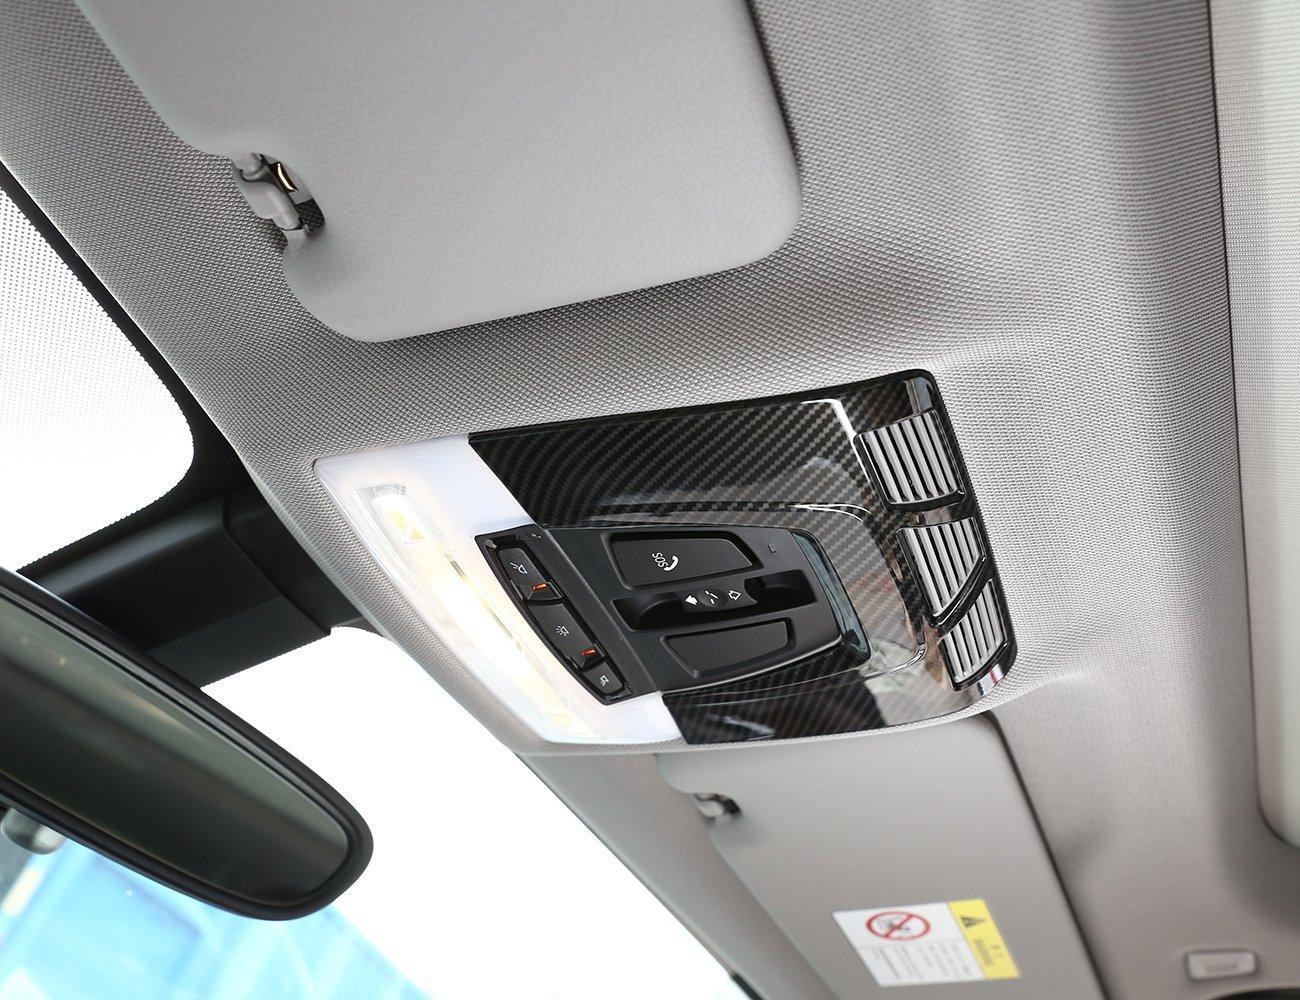 Innenraum-Rahmenaufkleber aus ABS//Chrom f/ür Leselampe in BMWs